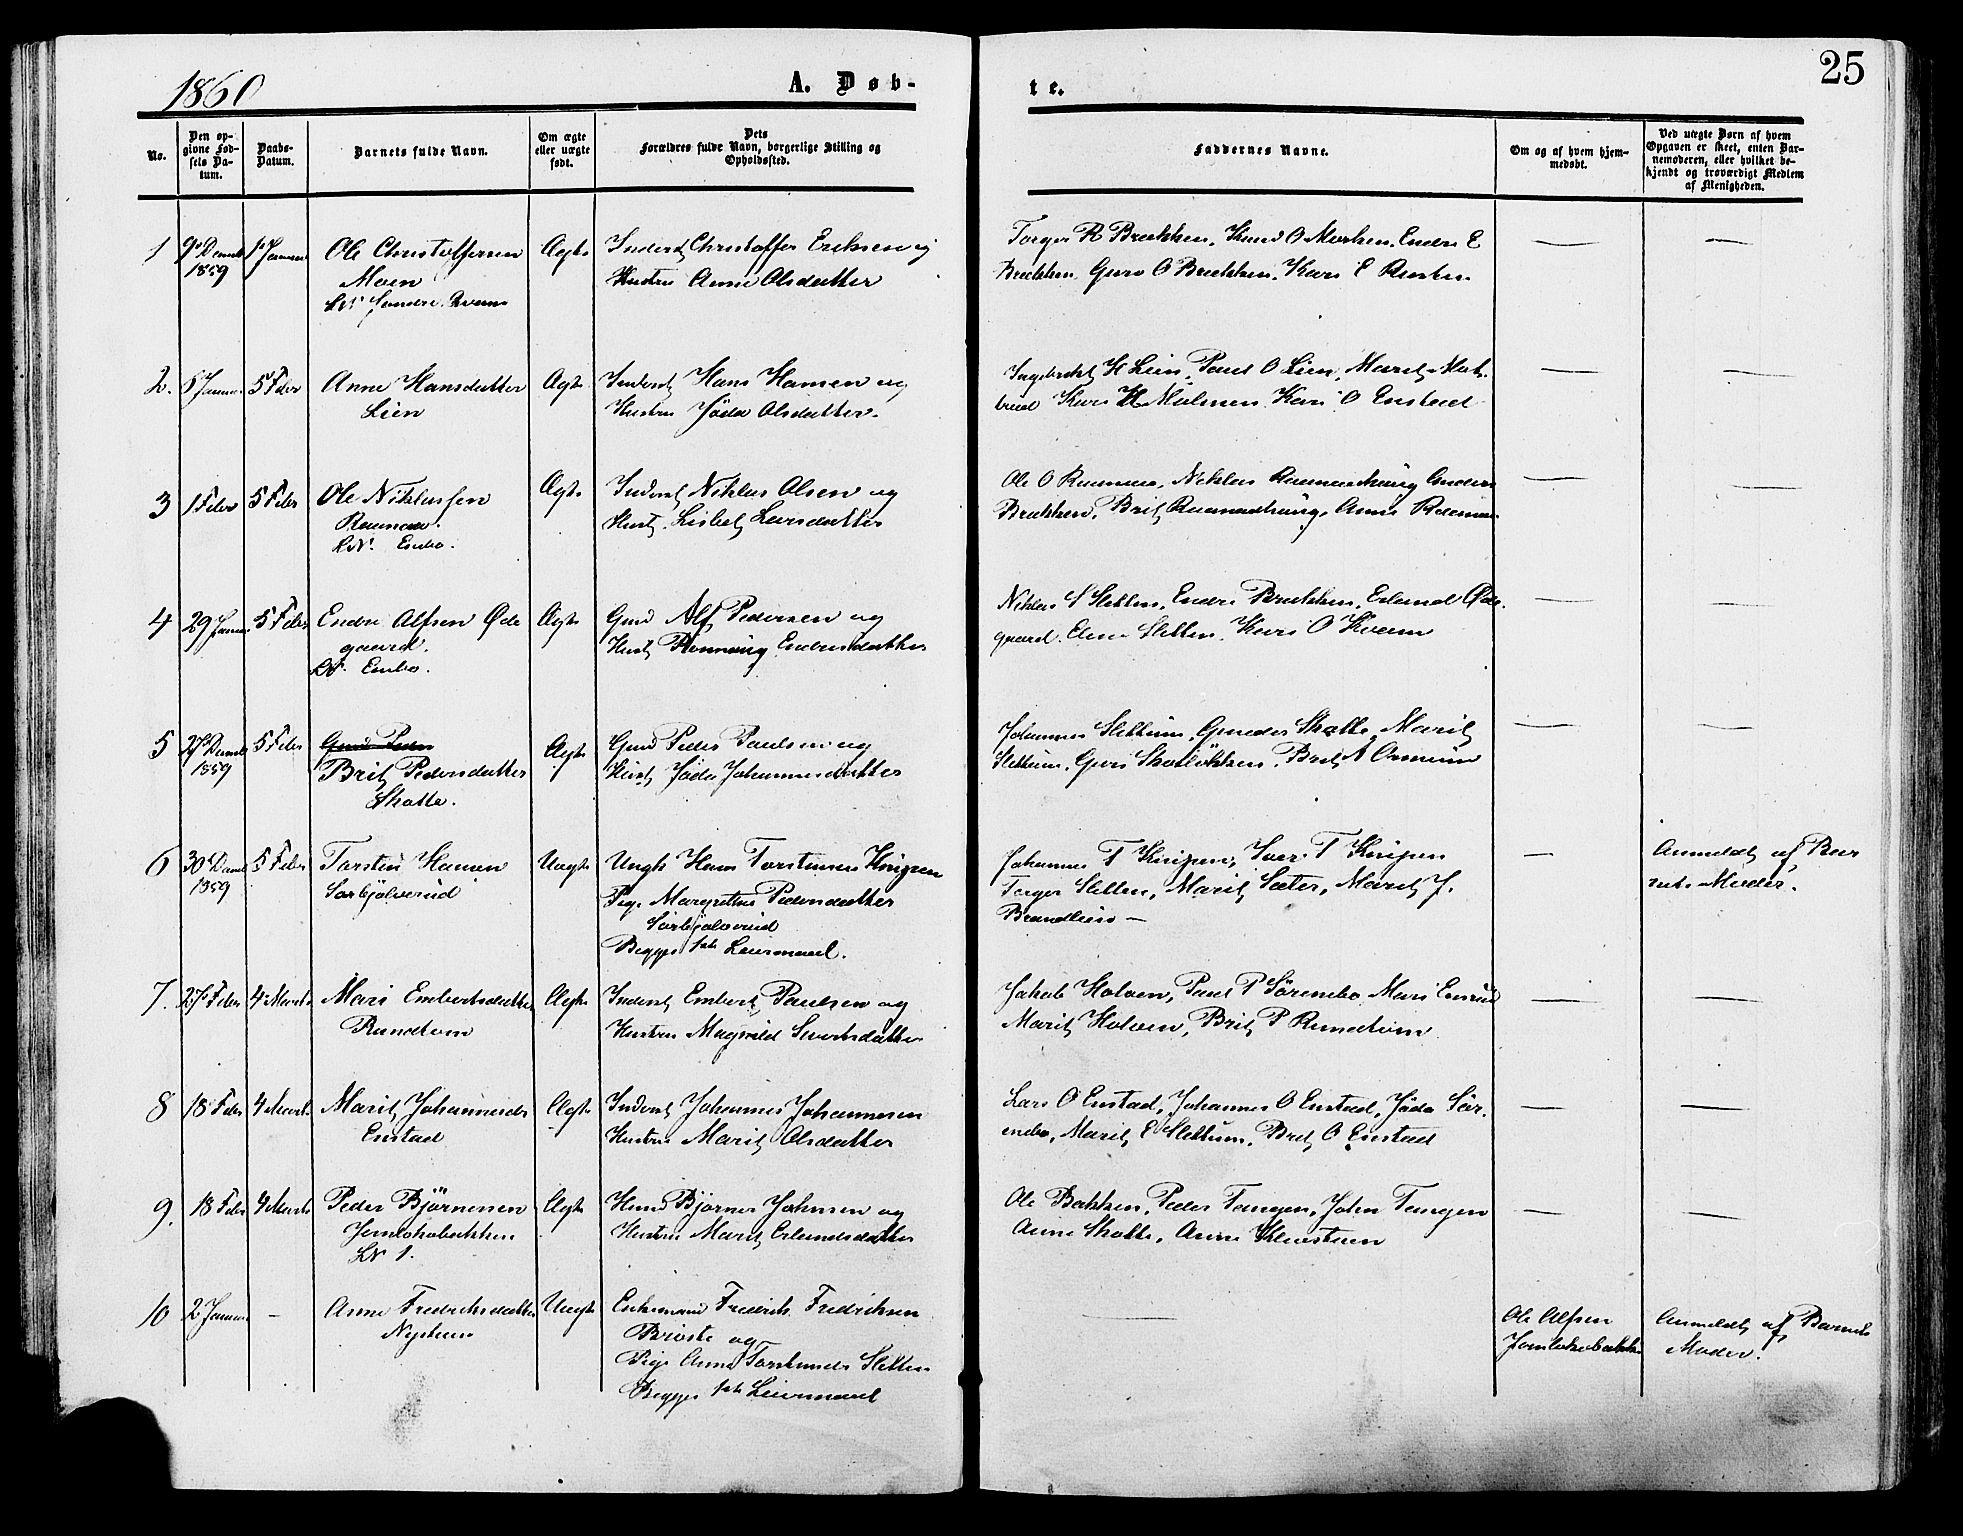 SAH, Lesja prestekontor, Ministerialbok nr. 9, 1854-1889, s. 25